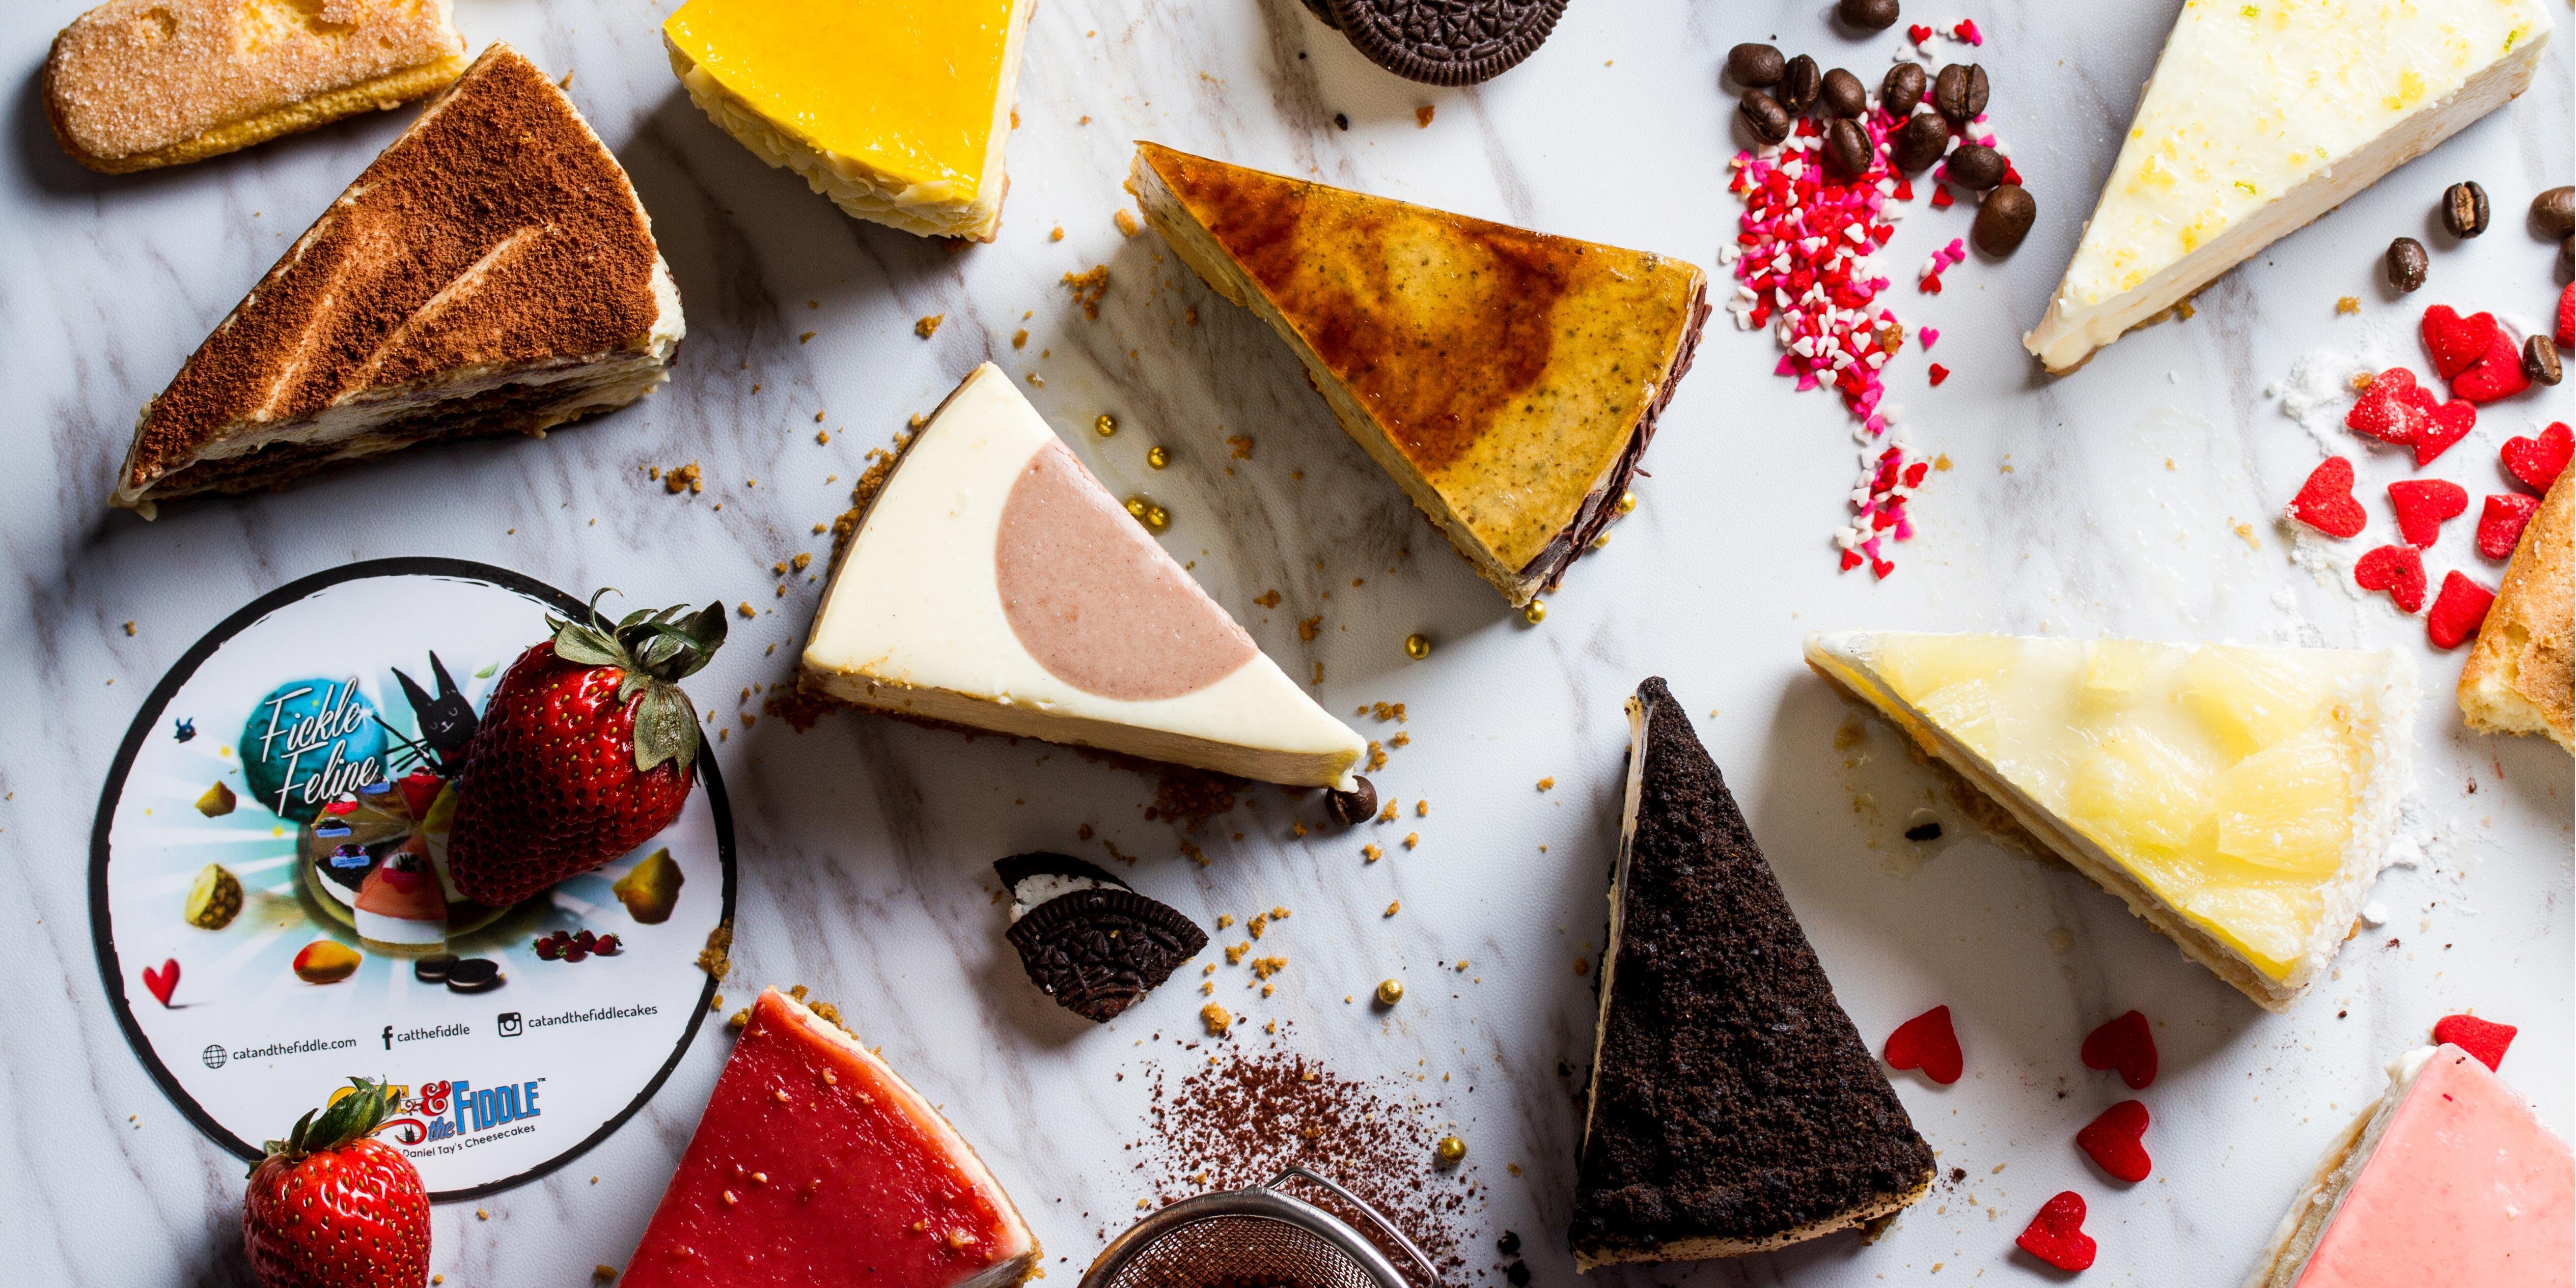 Best Cake Shop Reservoir